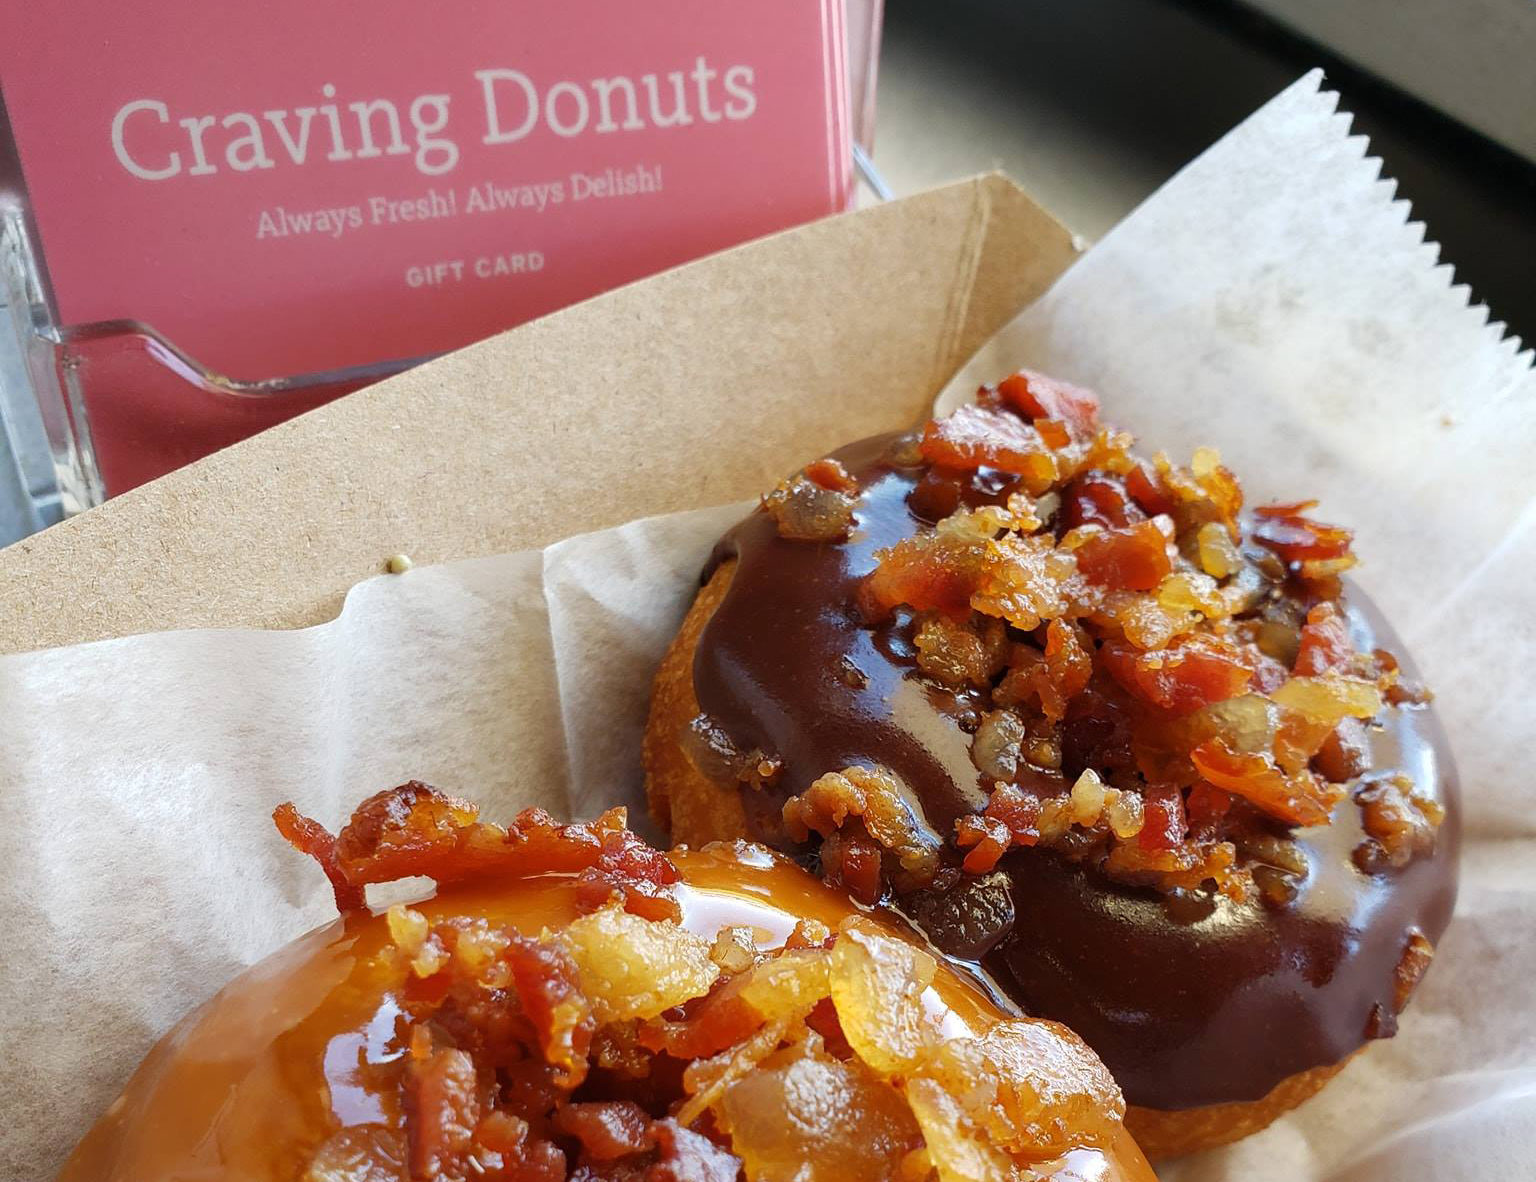 Craving Donuts